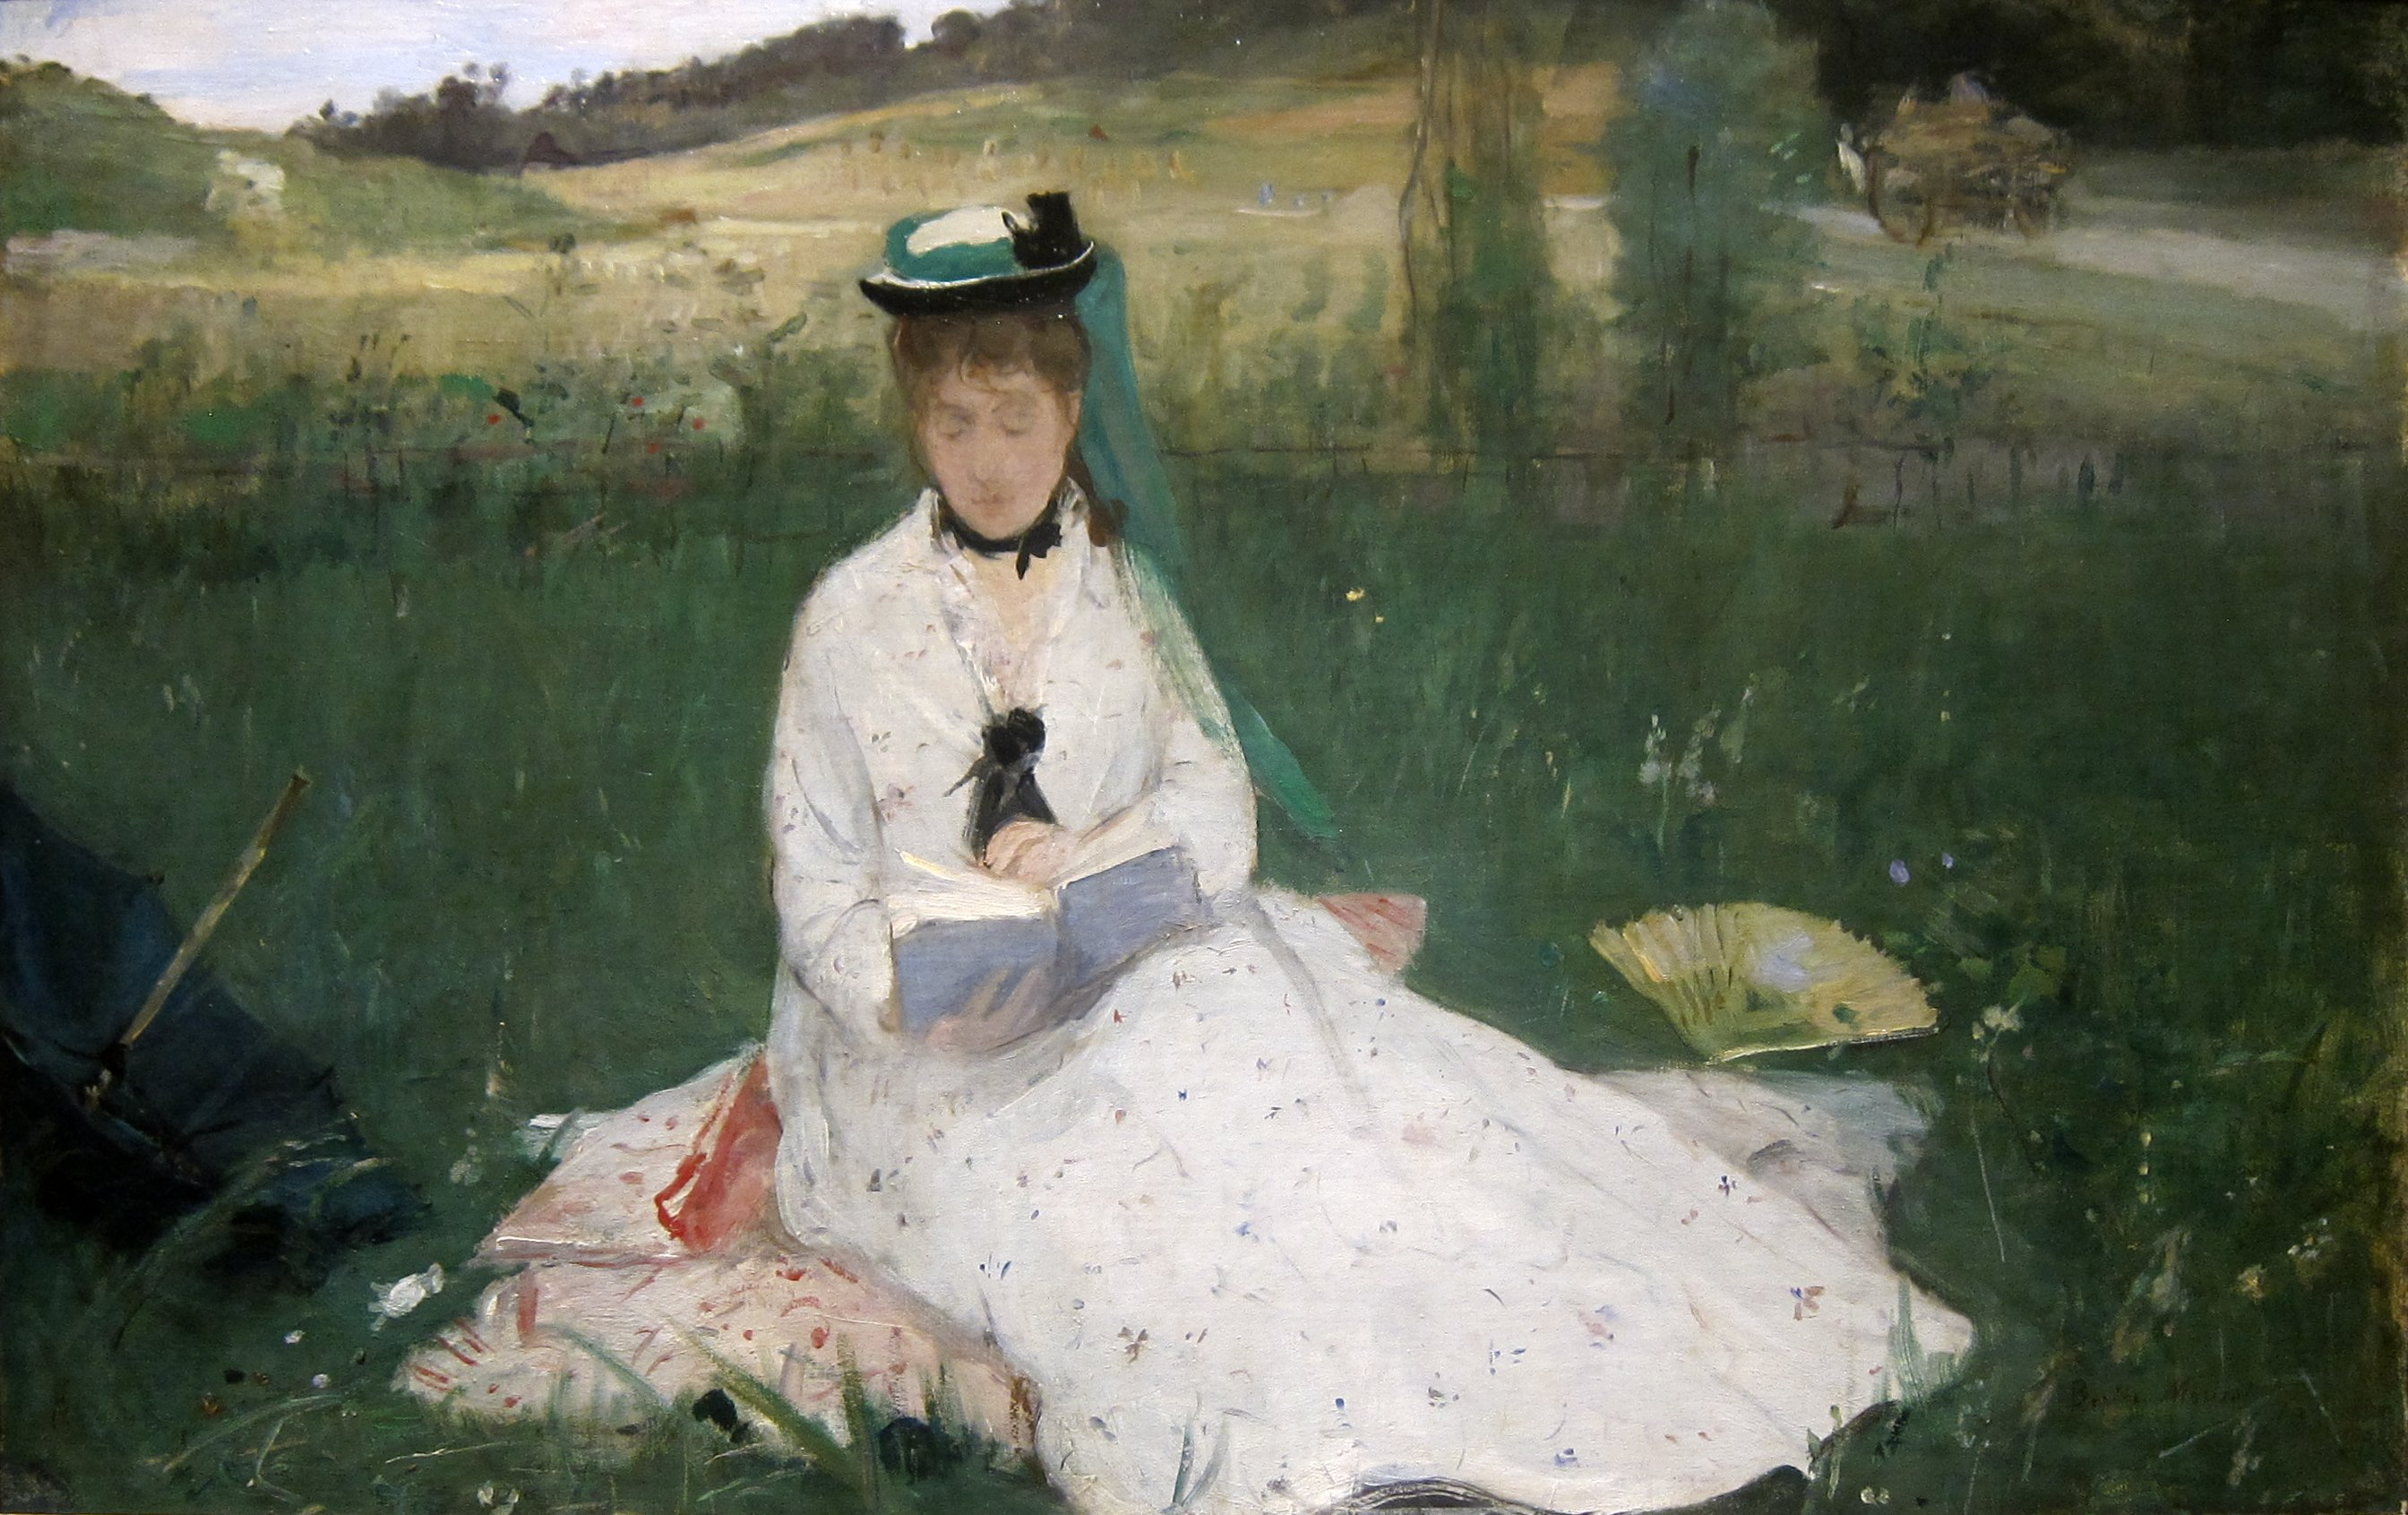 CC, Wikemedia Commons, Wmpearl (Berthe Morisot)